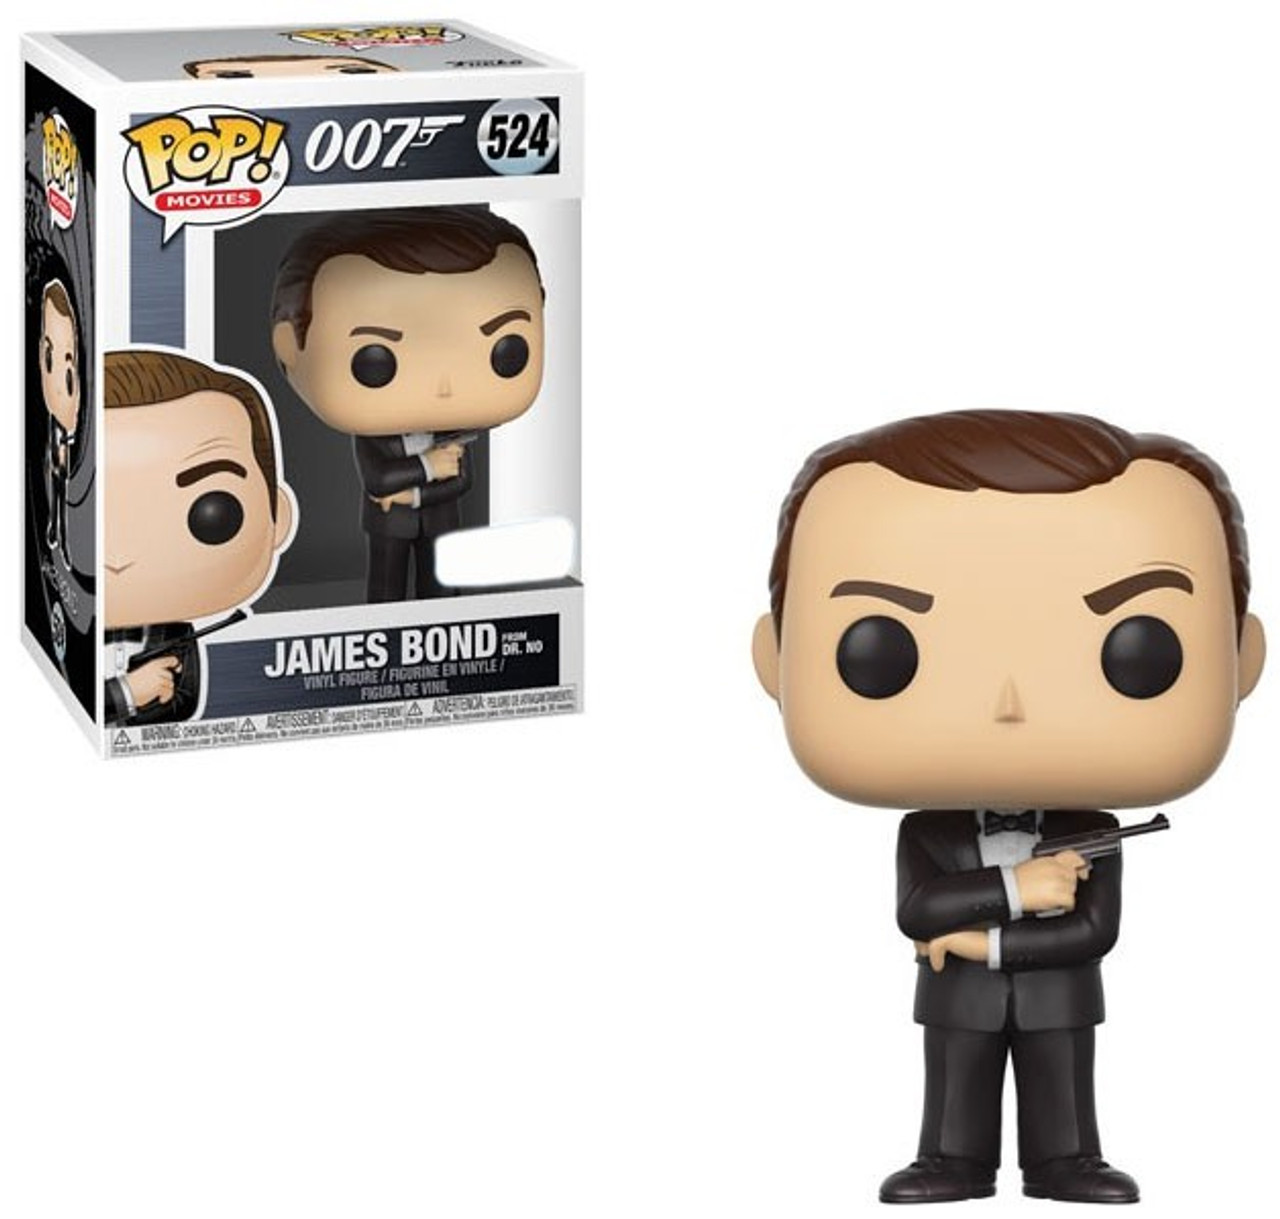 Sammler James Bond 007 Funko Pop Vinyl Figur 518 Sean Connery 9 cm NEU /& OVP